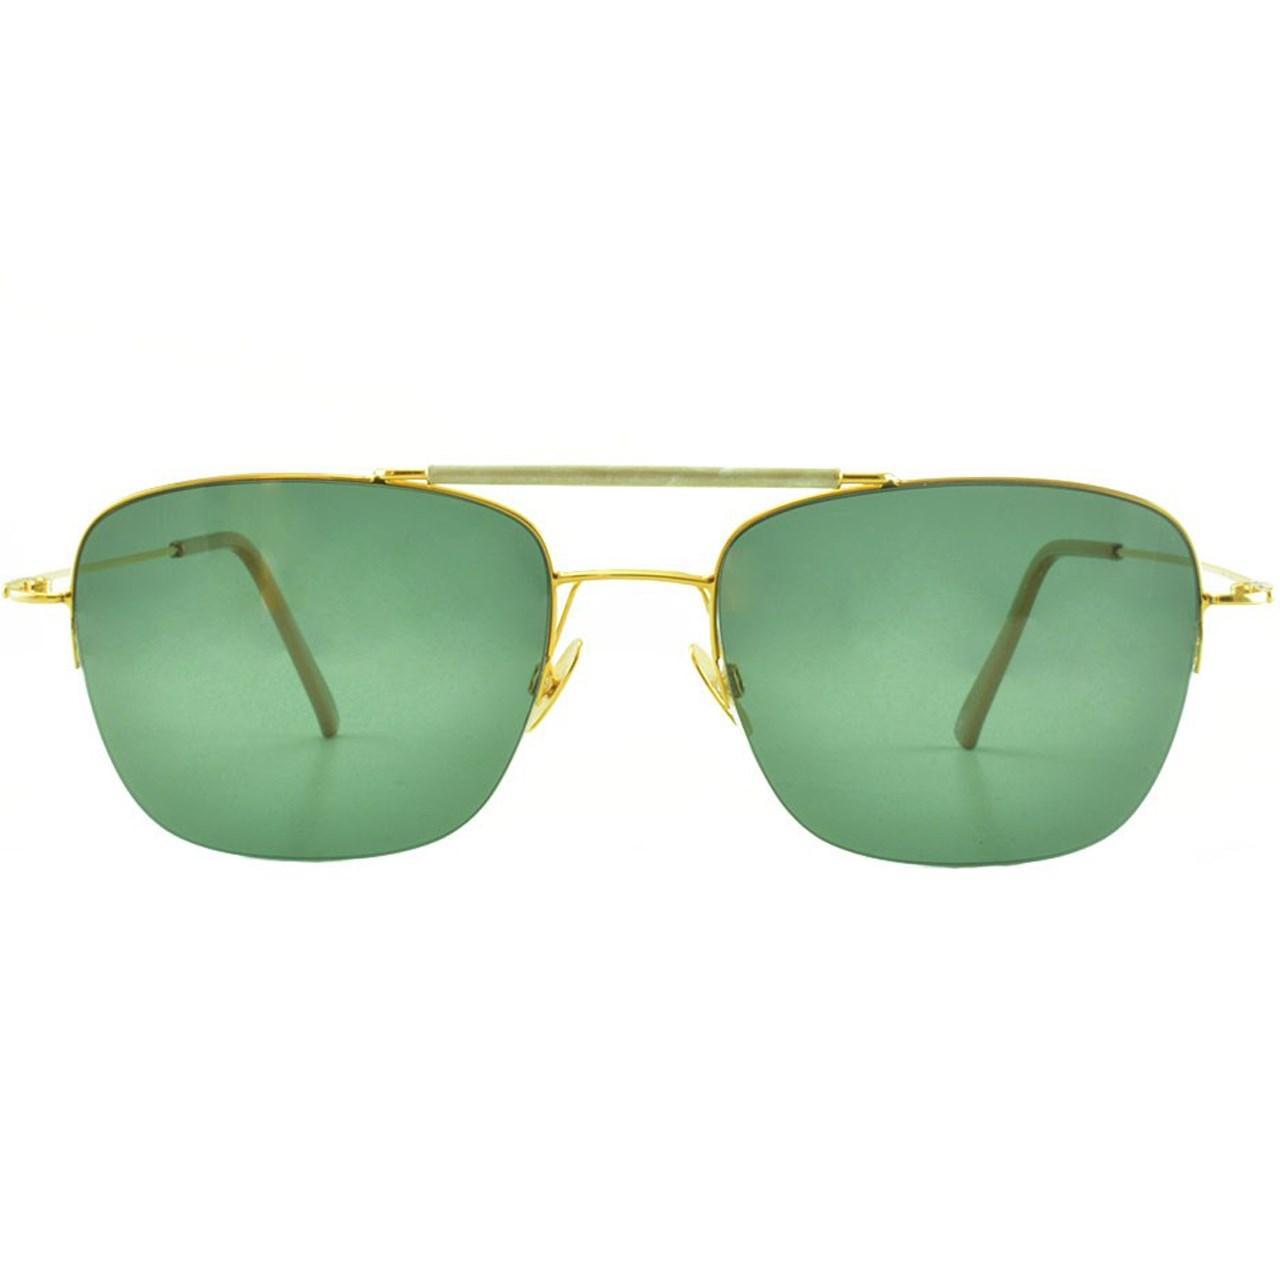 عینک آفتابی Nik03 سری Gold مدل Nk1107 Rgp